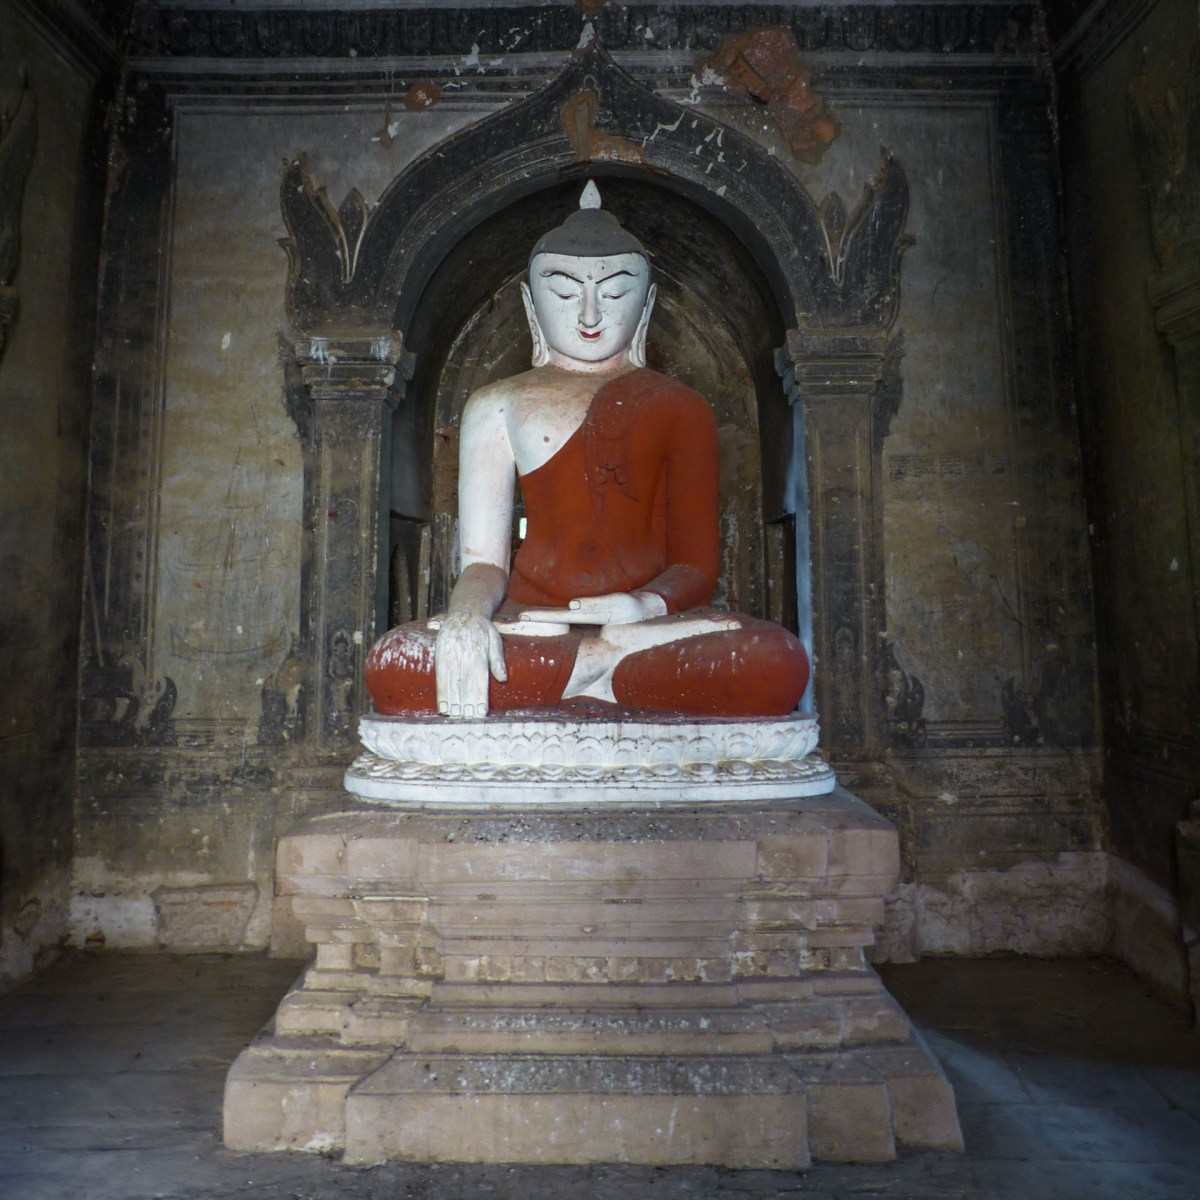 Sitting Buddha with red robe - Bagan temple Christian Jansen & Maria Düerkop